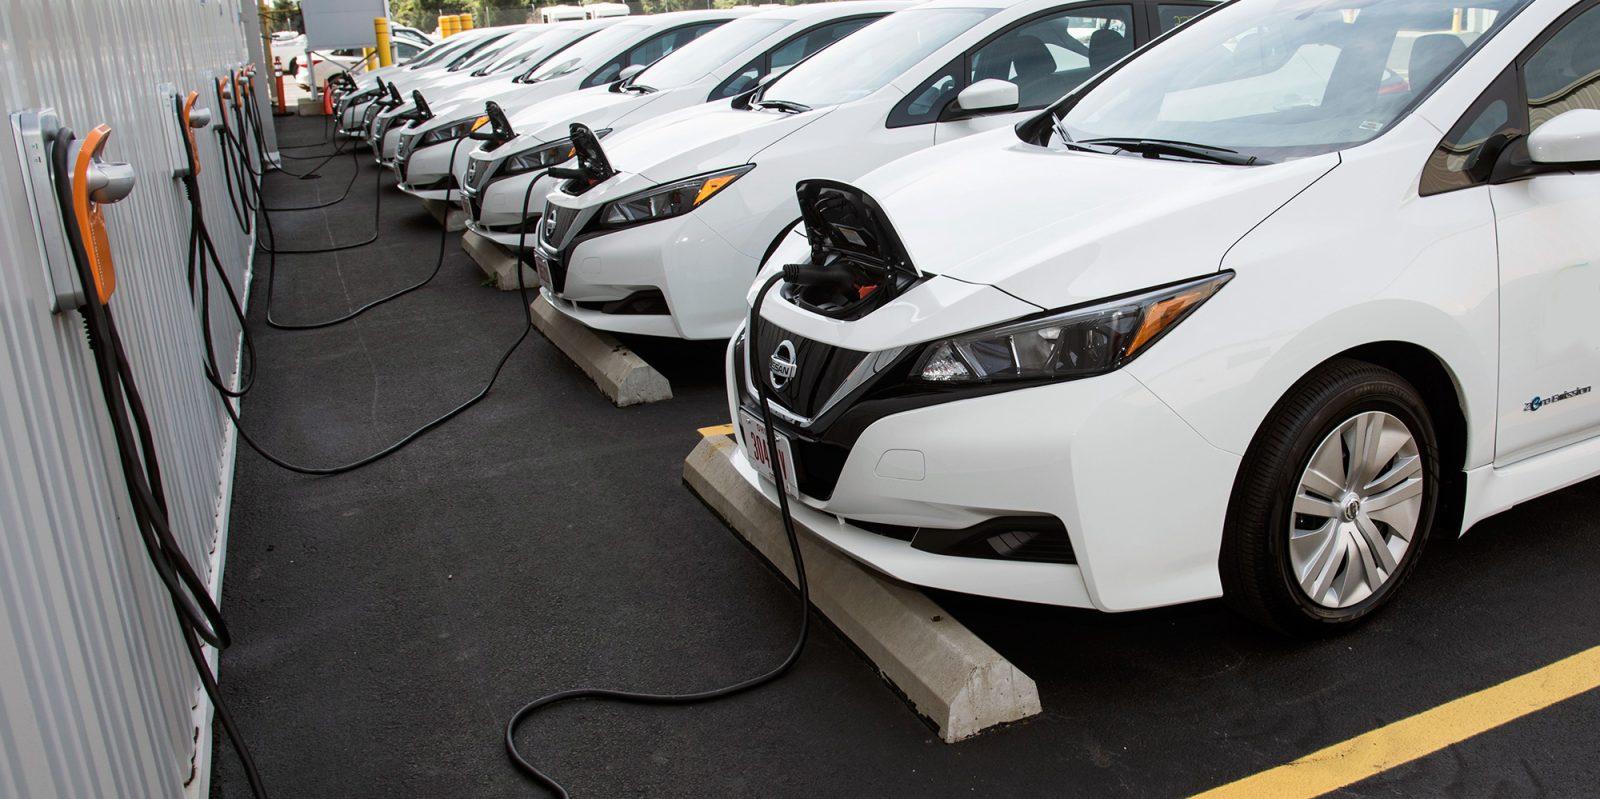 Stát chce do roku 2030 navýšit počet elektromobilů na statisíce